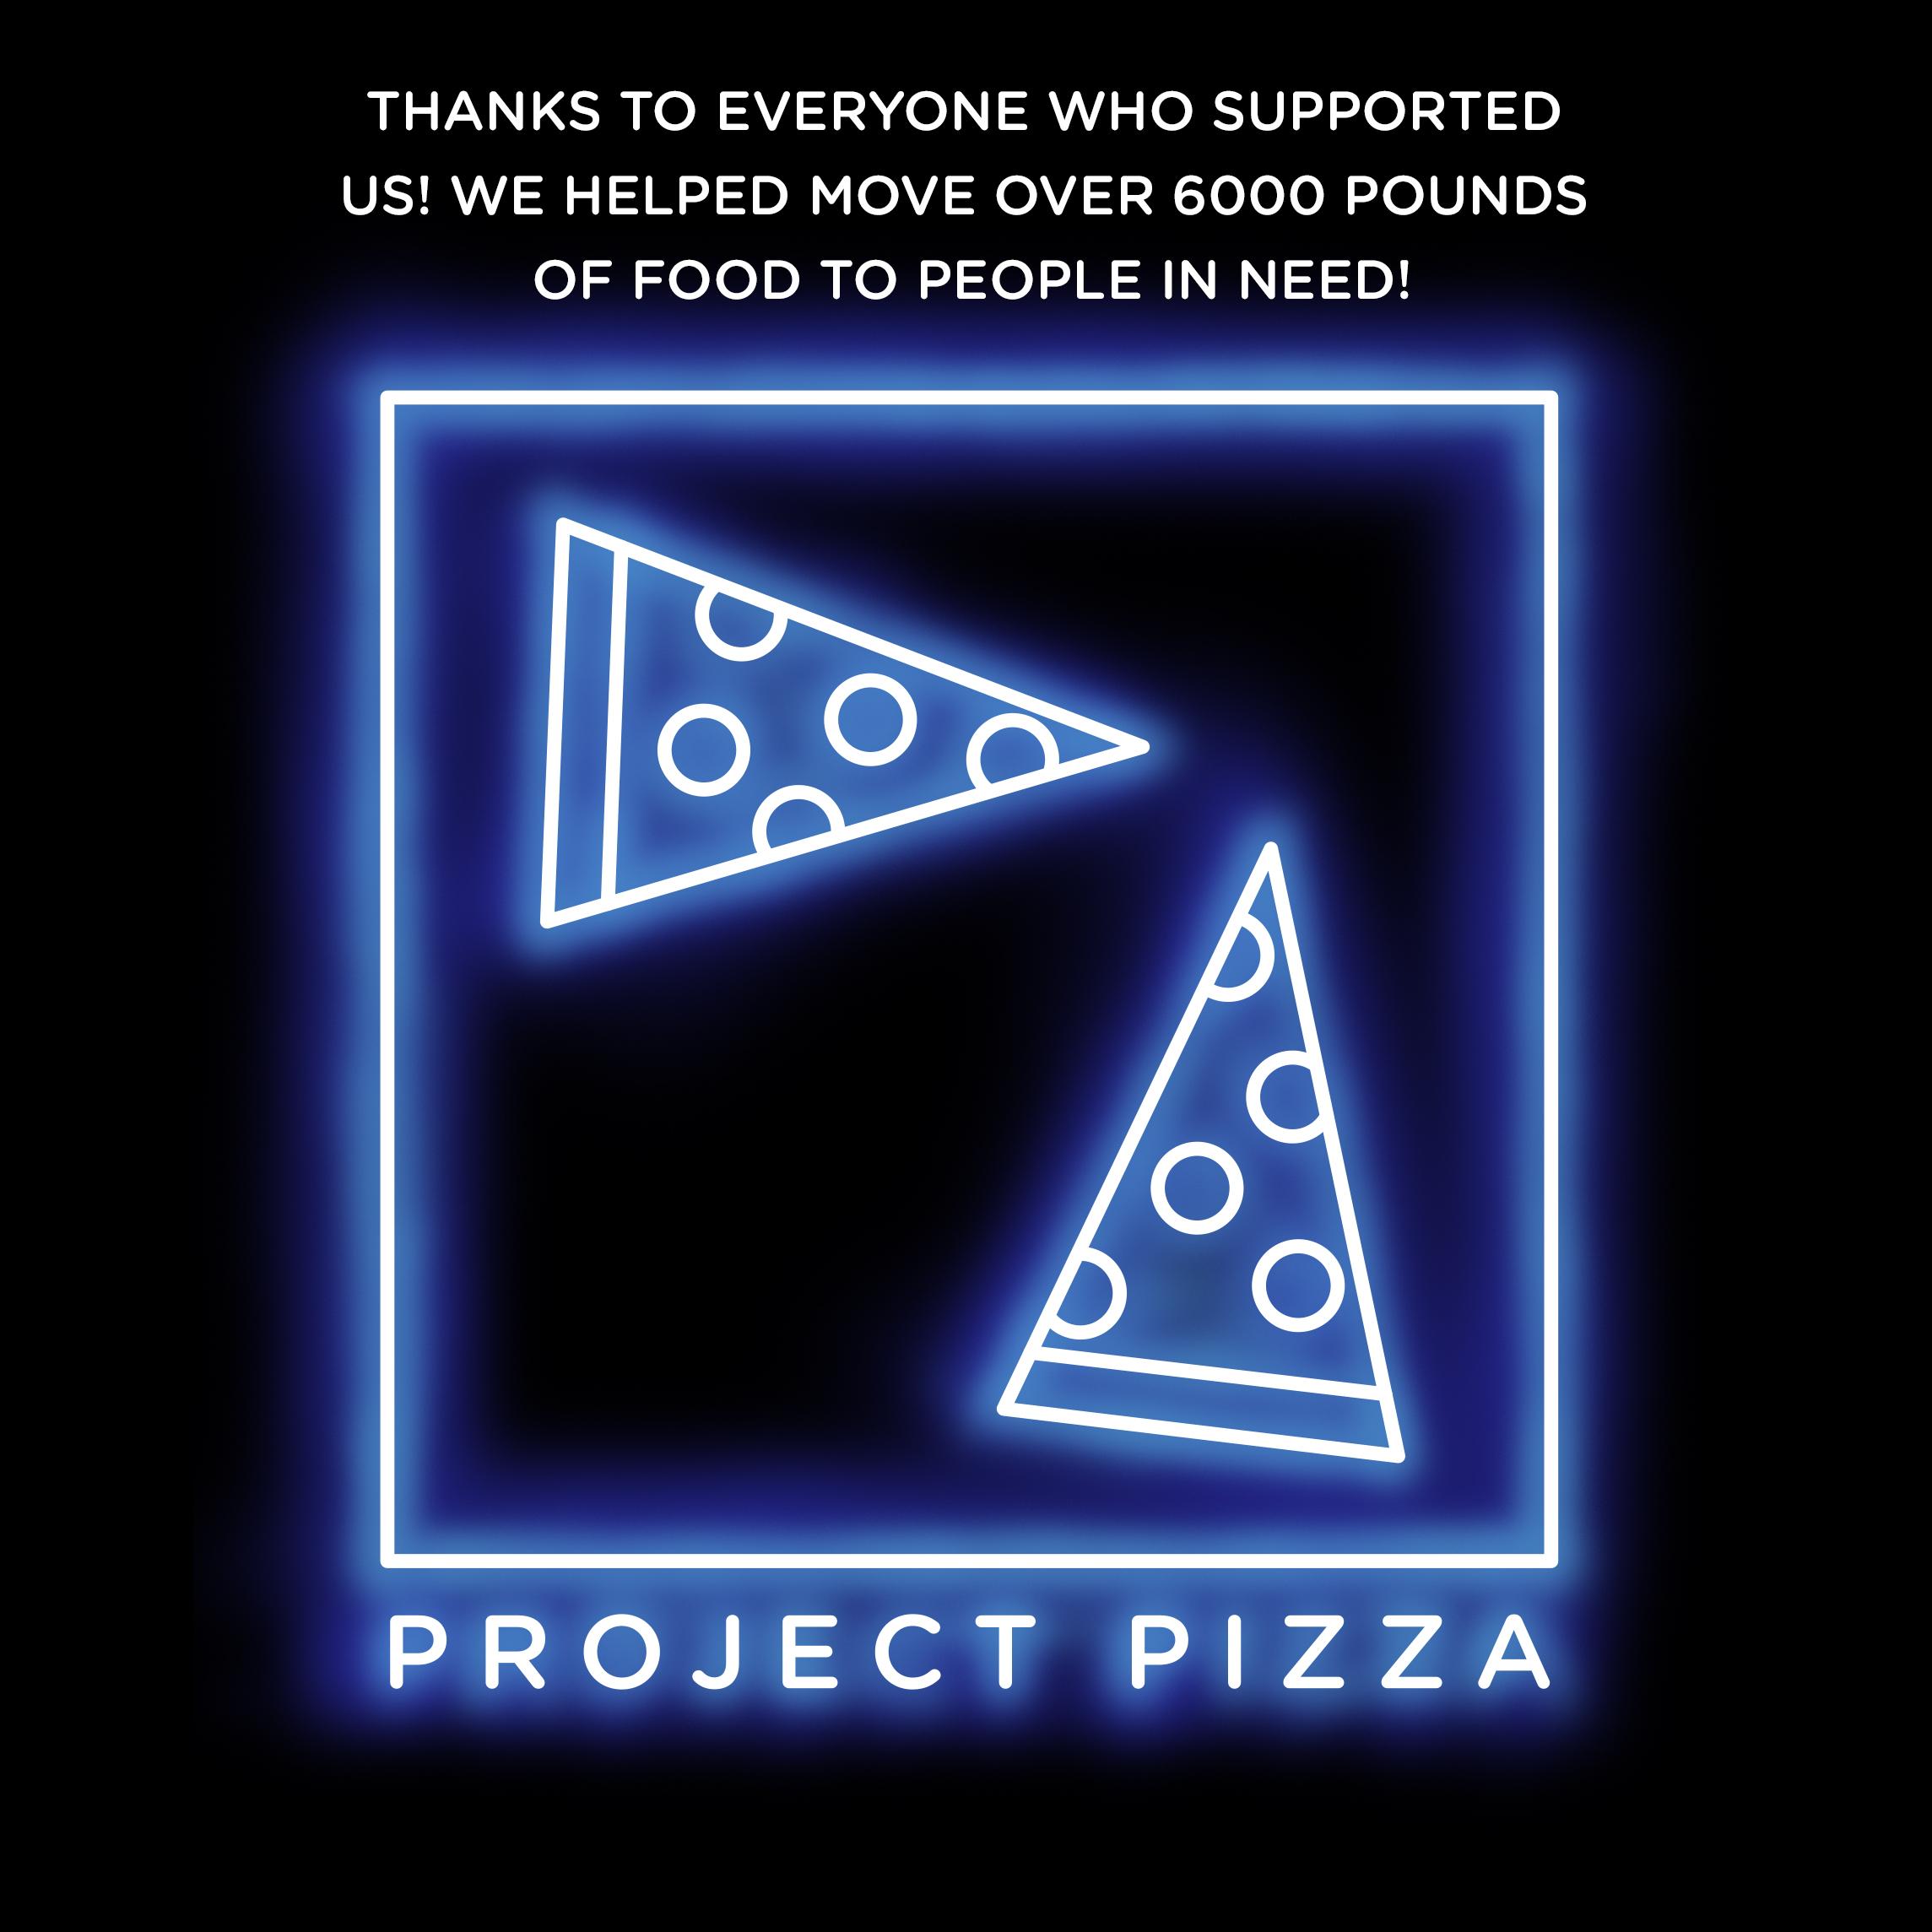 Project-Pizza-Logo-Bumper-3.jpg